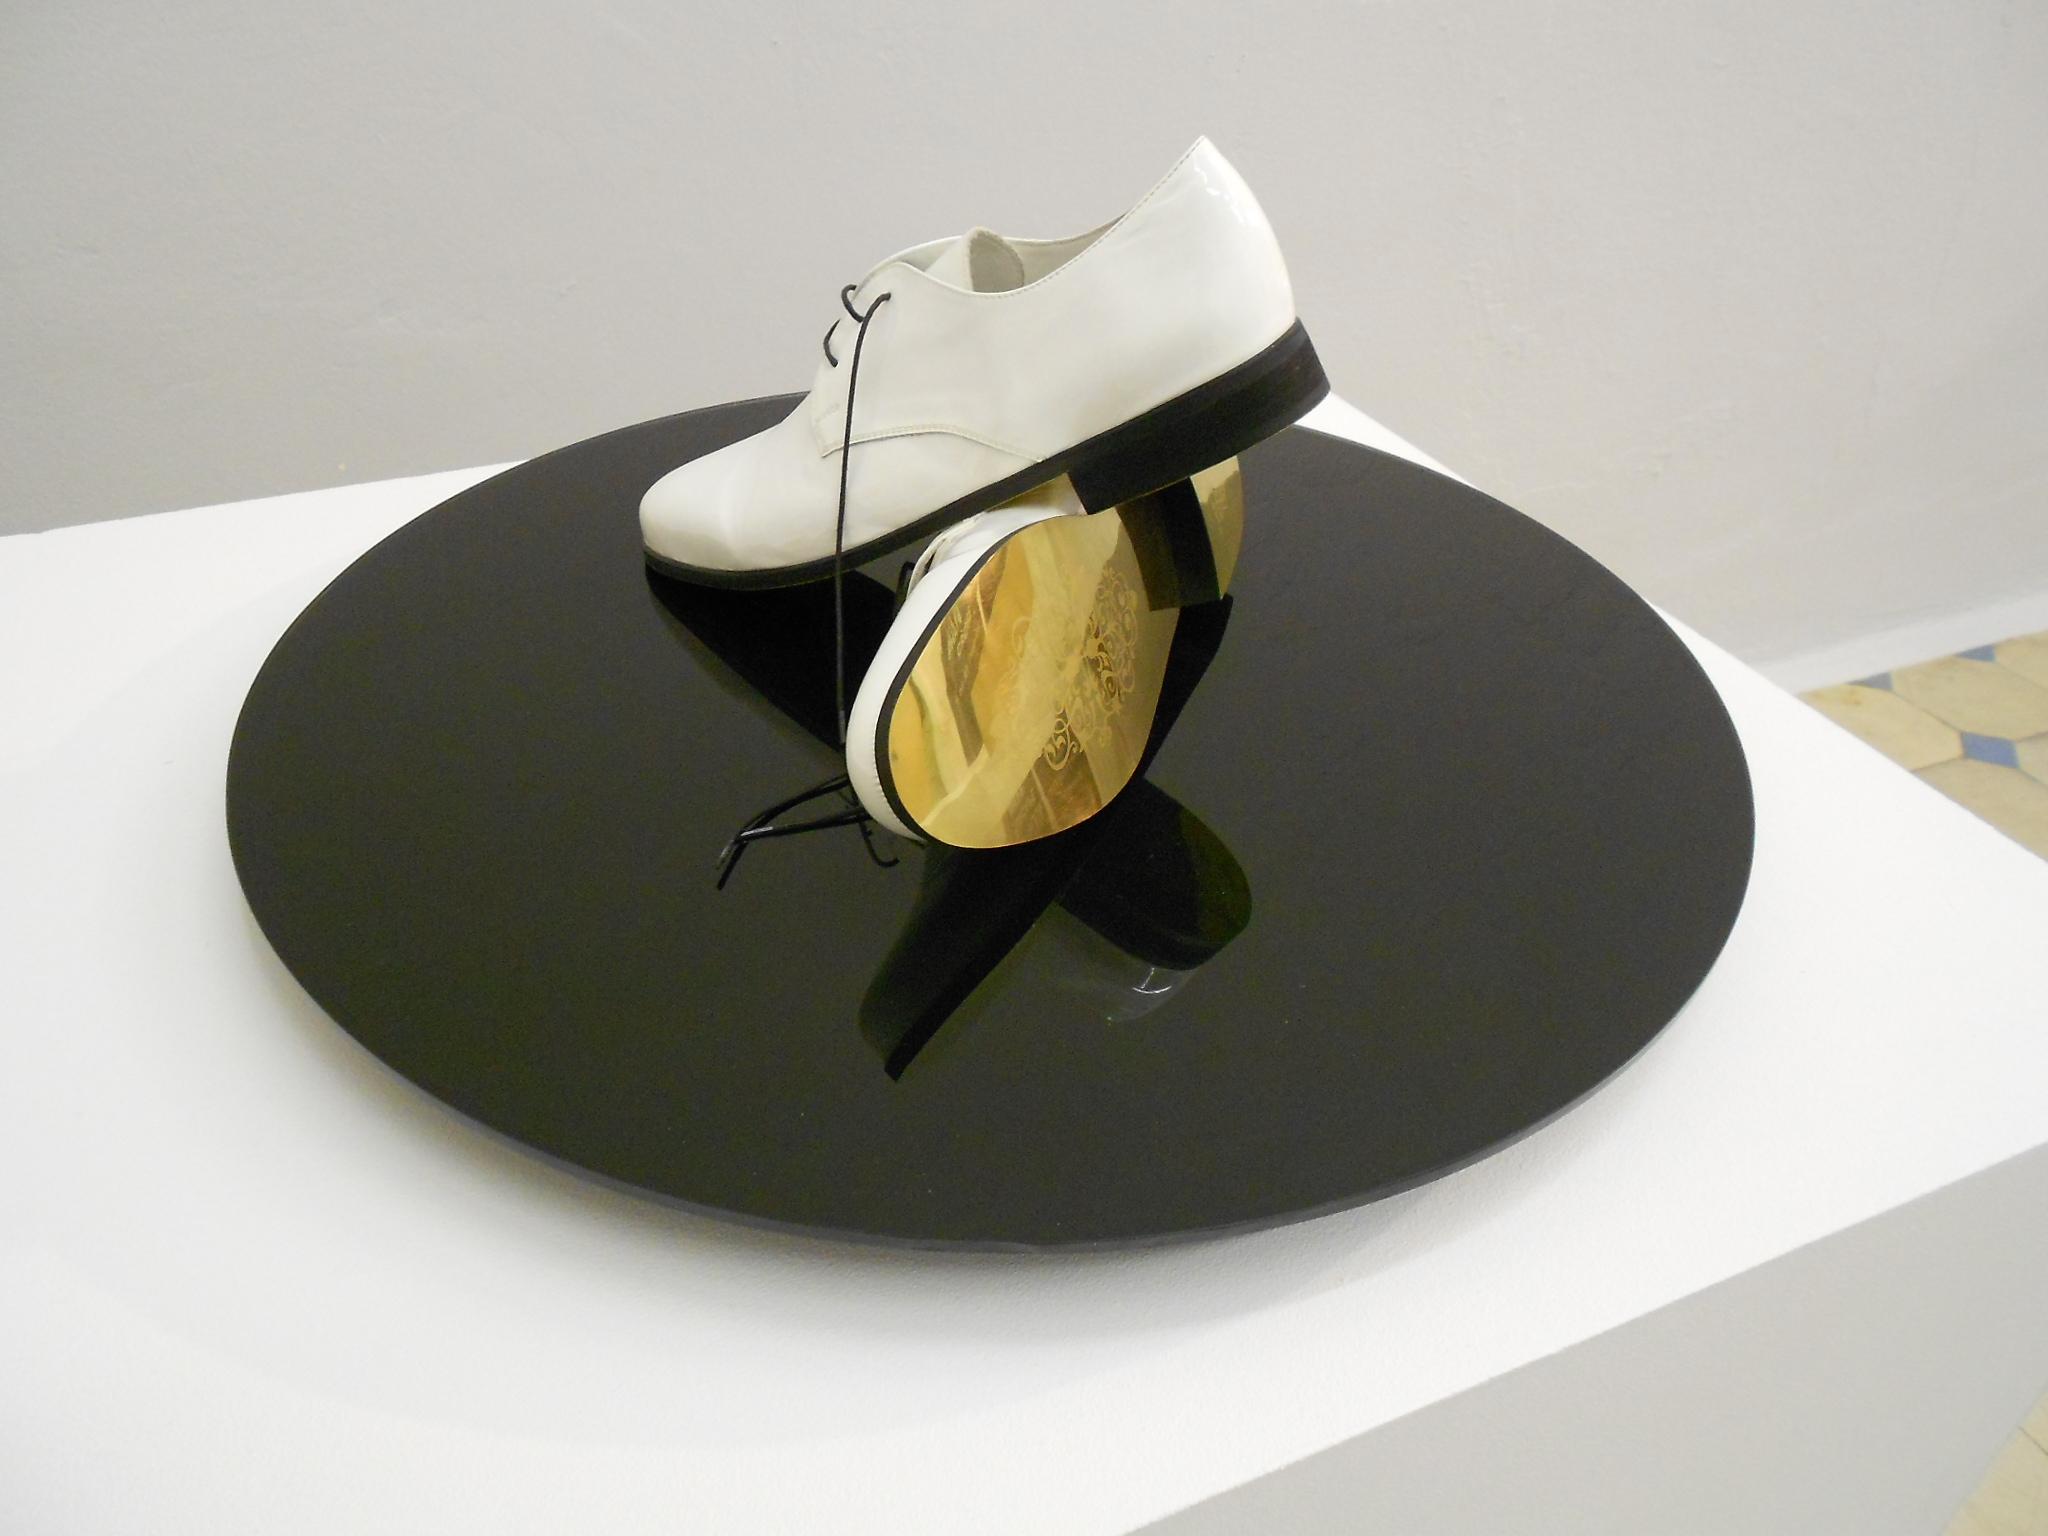 8. Radu Cioca - ÔÇťGolden shoes for golden routesÔÇŁ (installation)